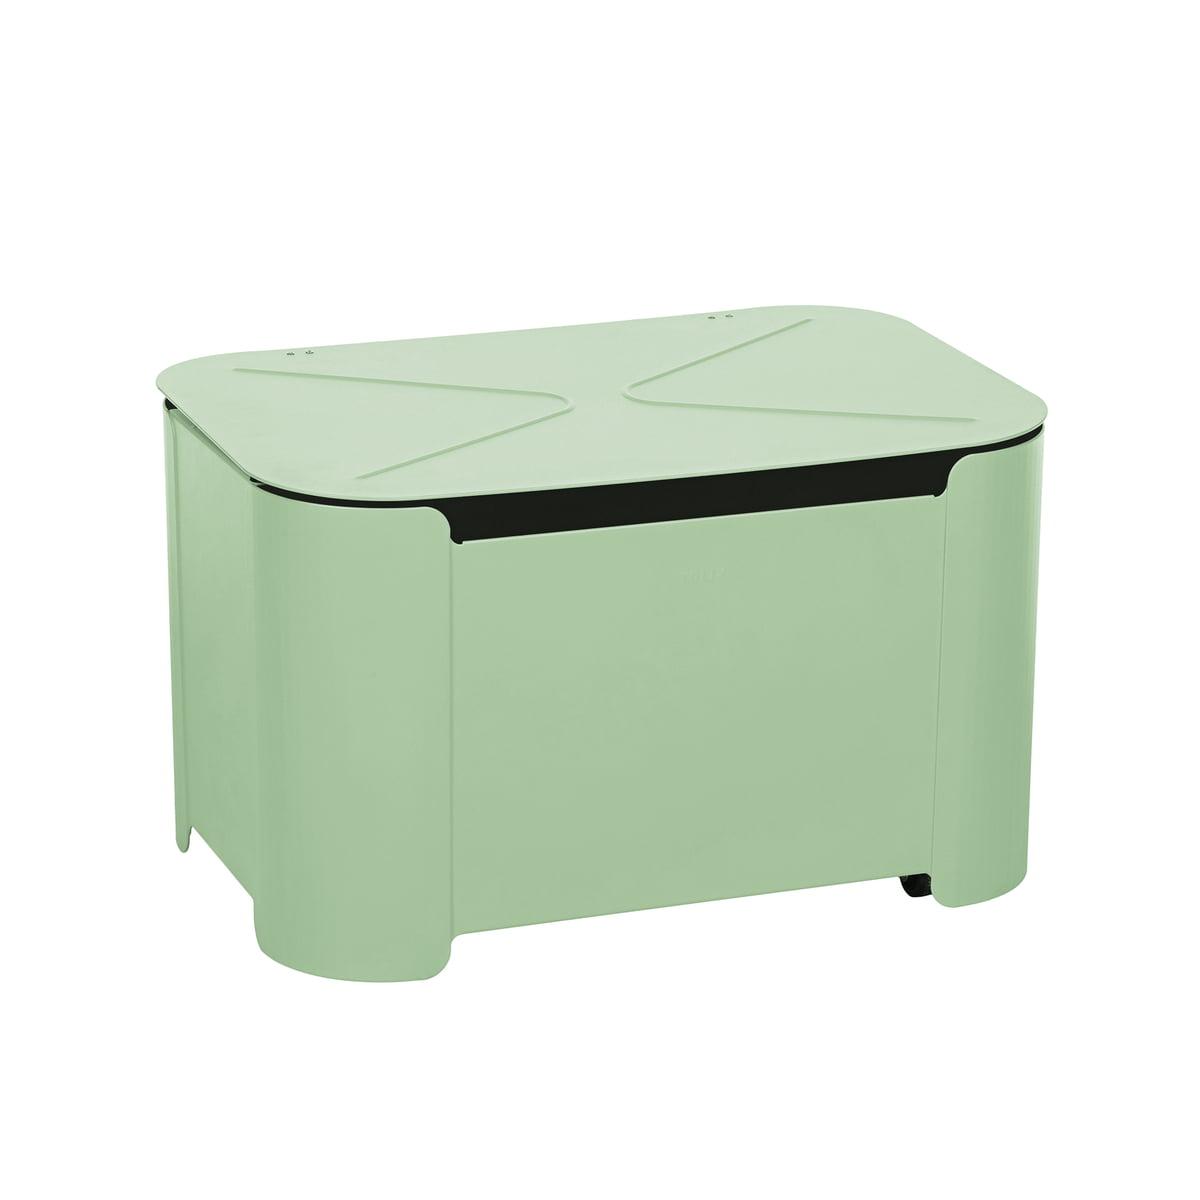 Outdoor Truhe.Tolix Storage Box Tortue Anise Green Matt